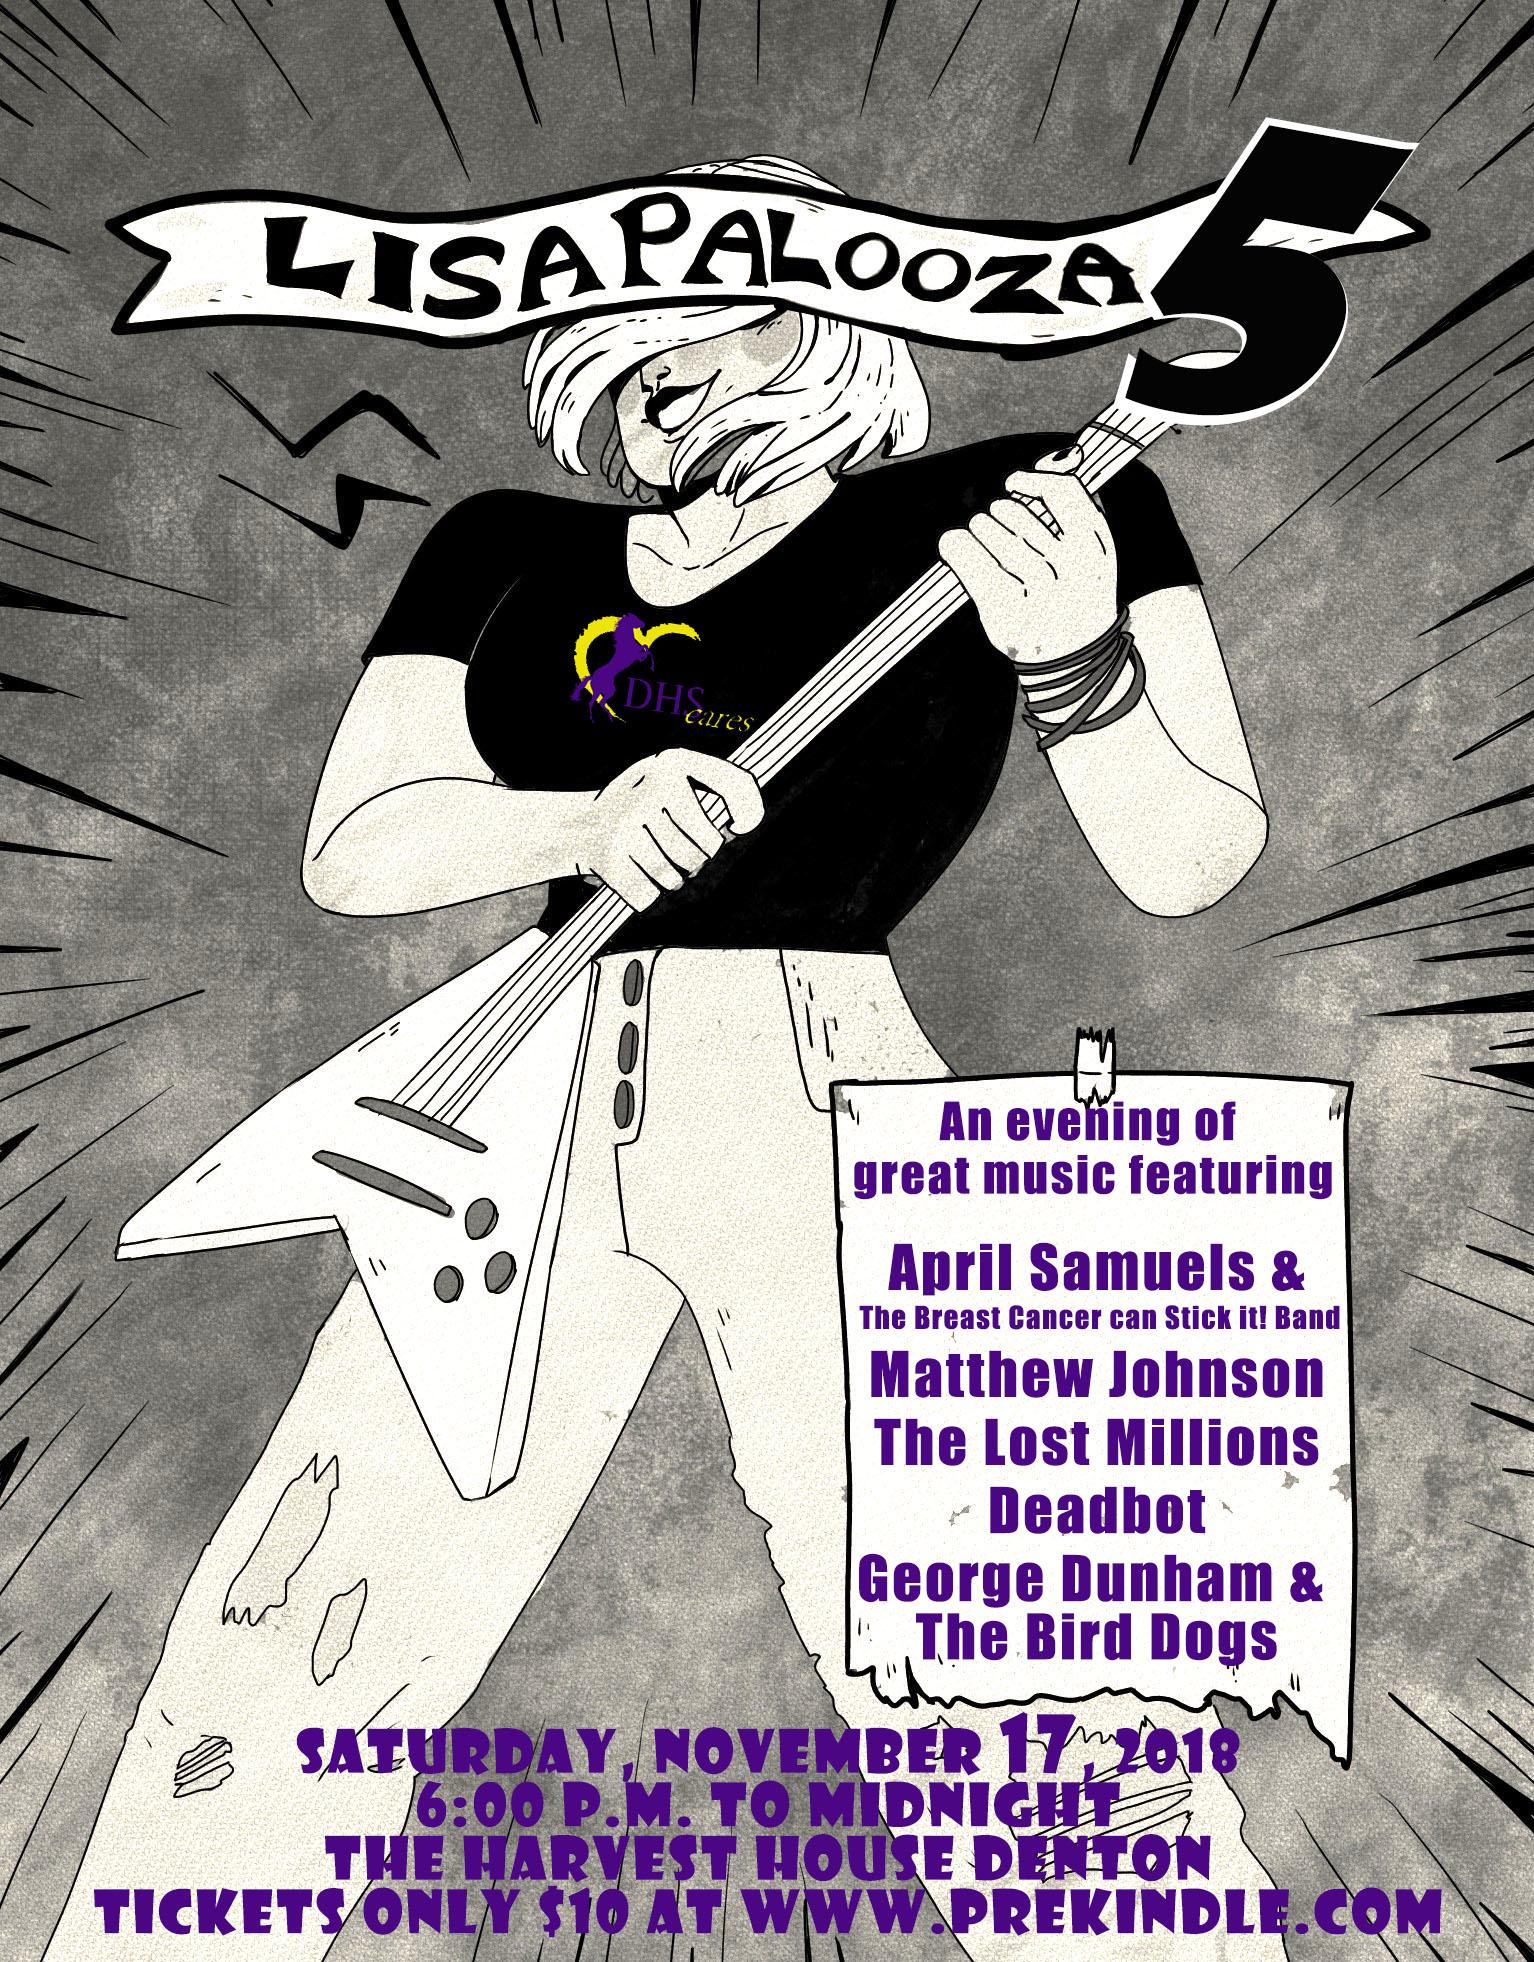 Denton High Cares Awards Scholarship to Winner of Lisapalooza 5 Poster Contest